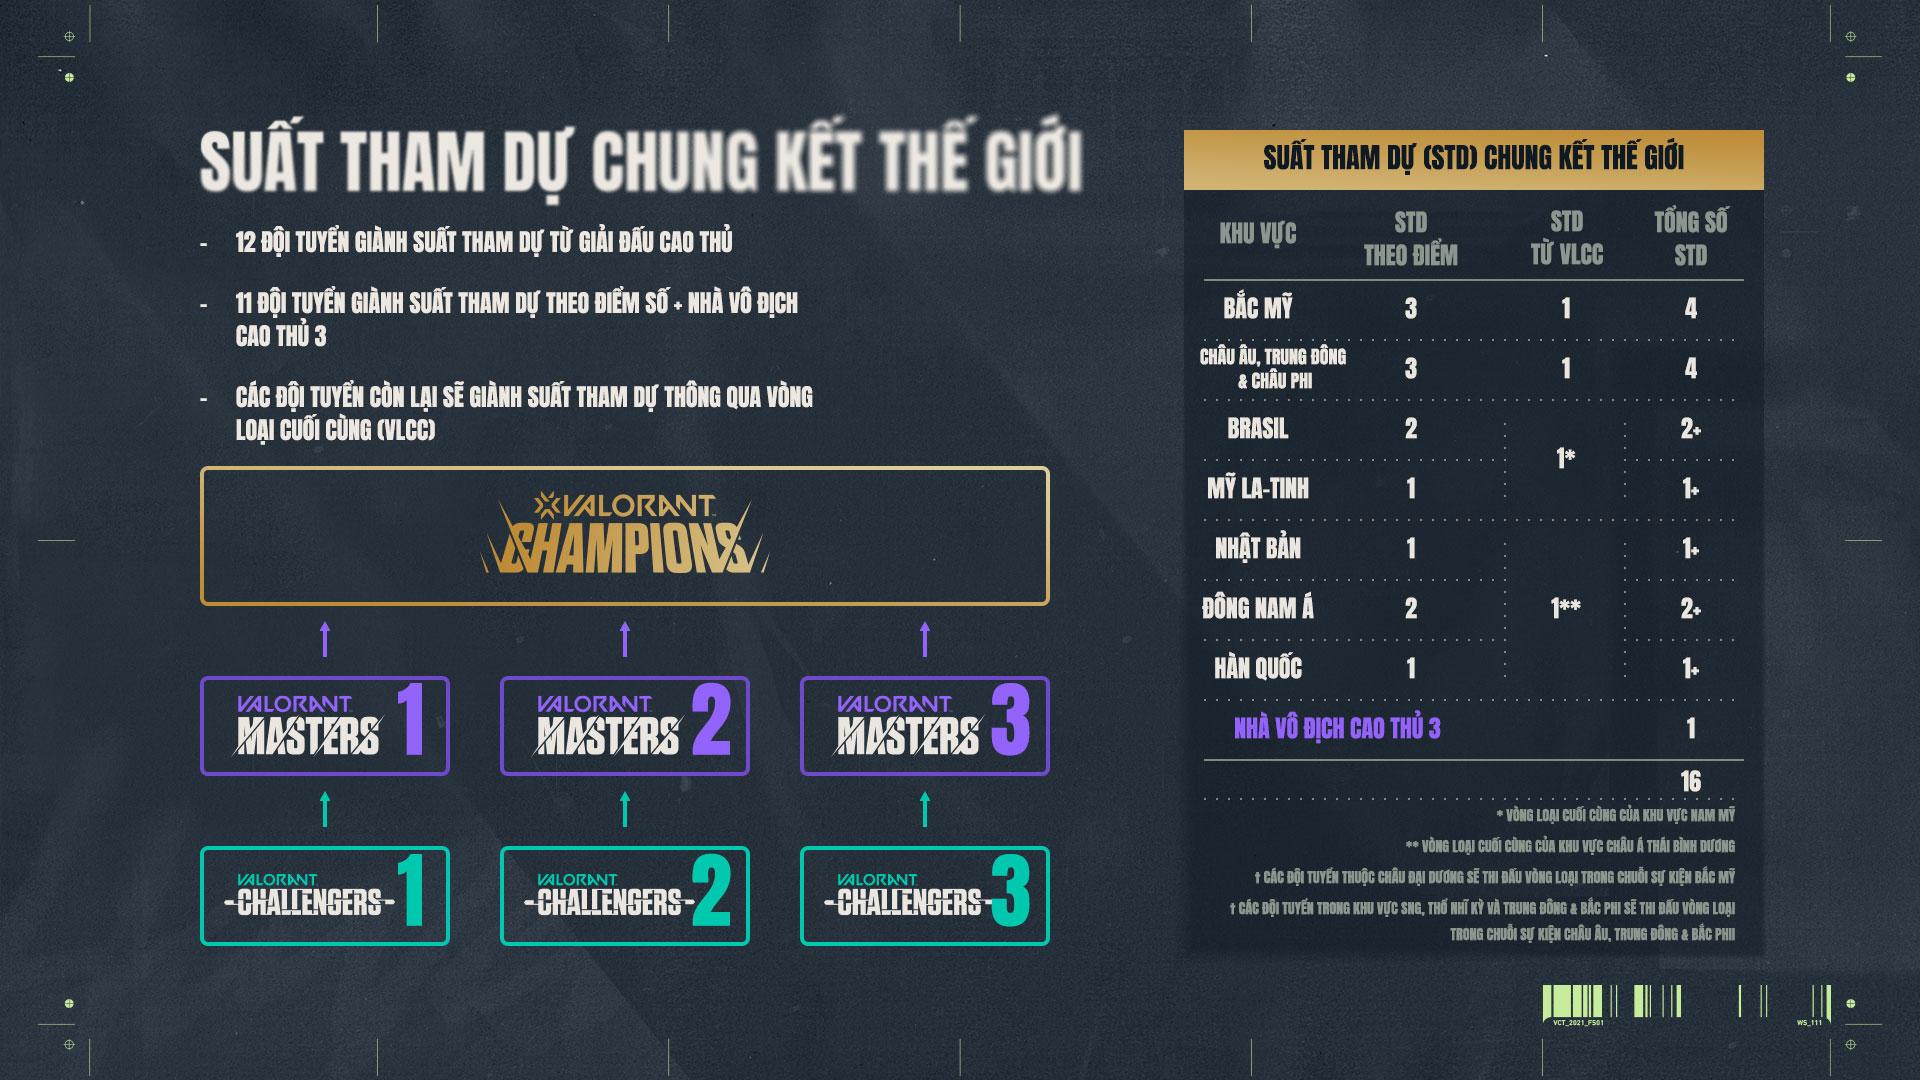 vi_vi_Copy-of-04-championsqualification-v1.0.jpg